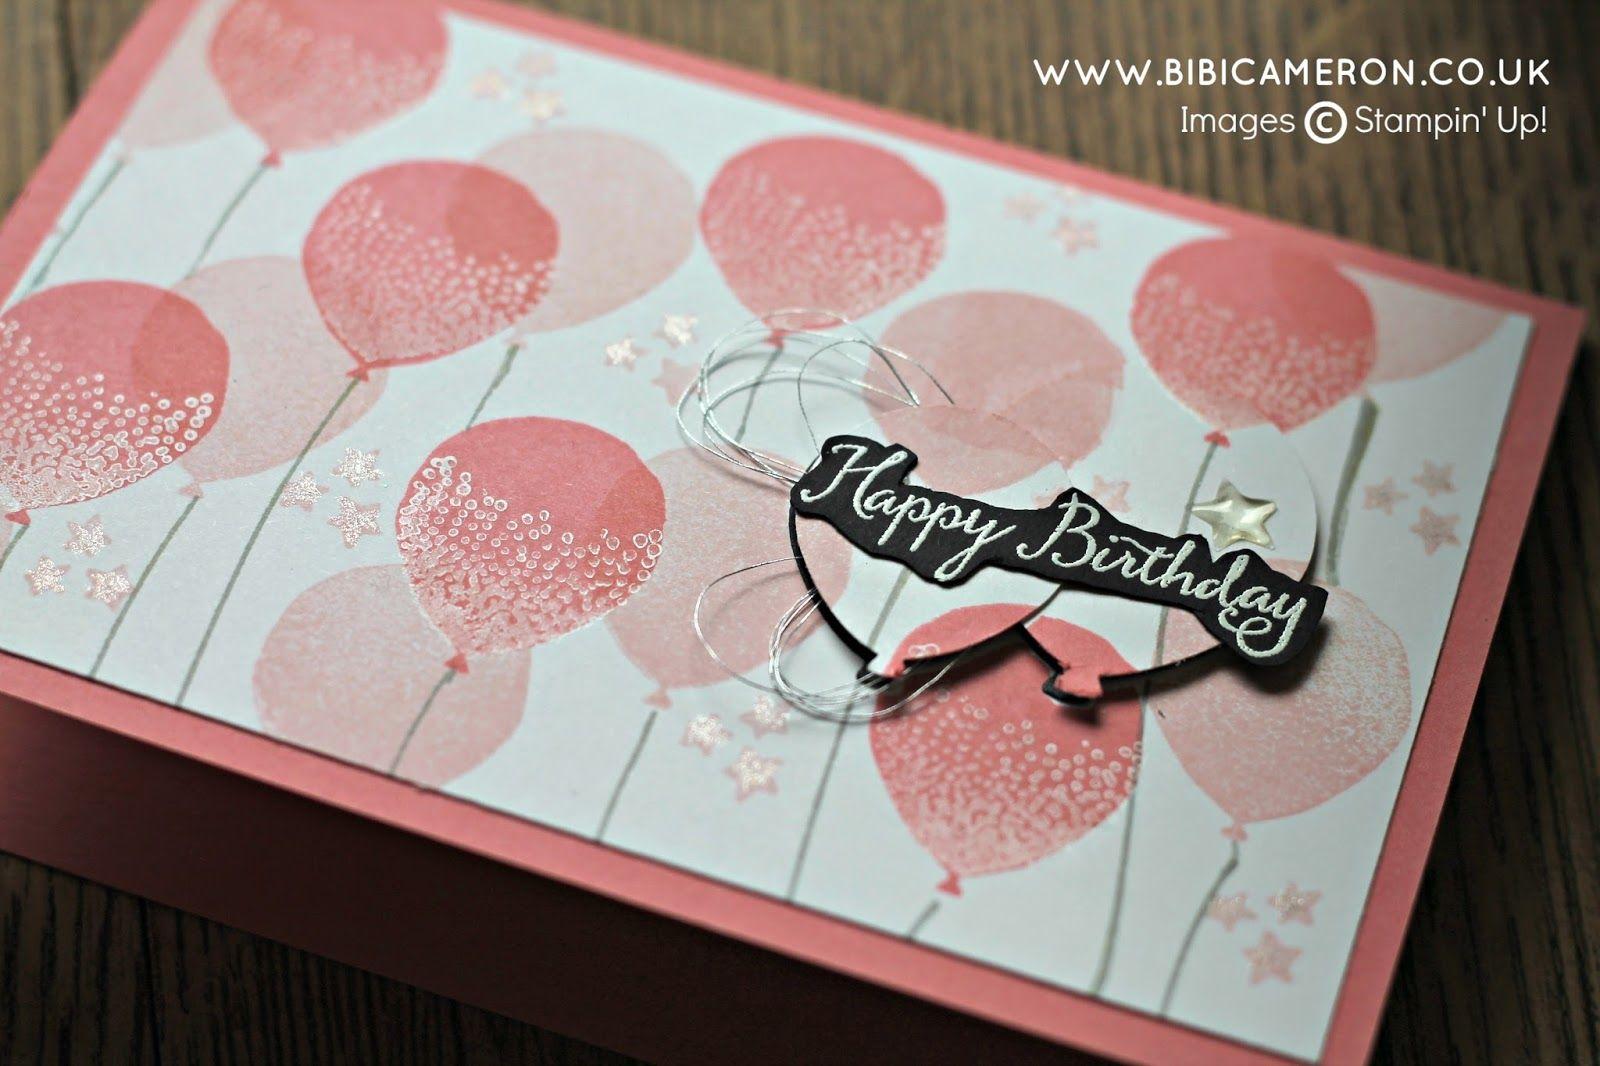 Bibi cameron papercraft designer celebrations stampin up and cards m4hsunfo